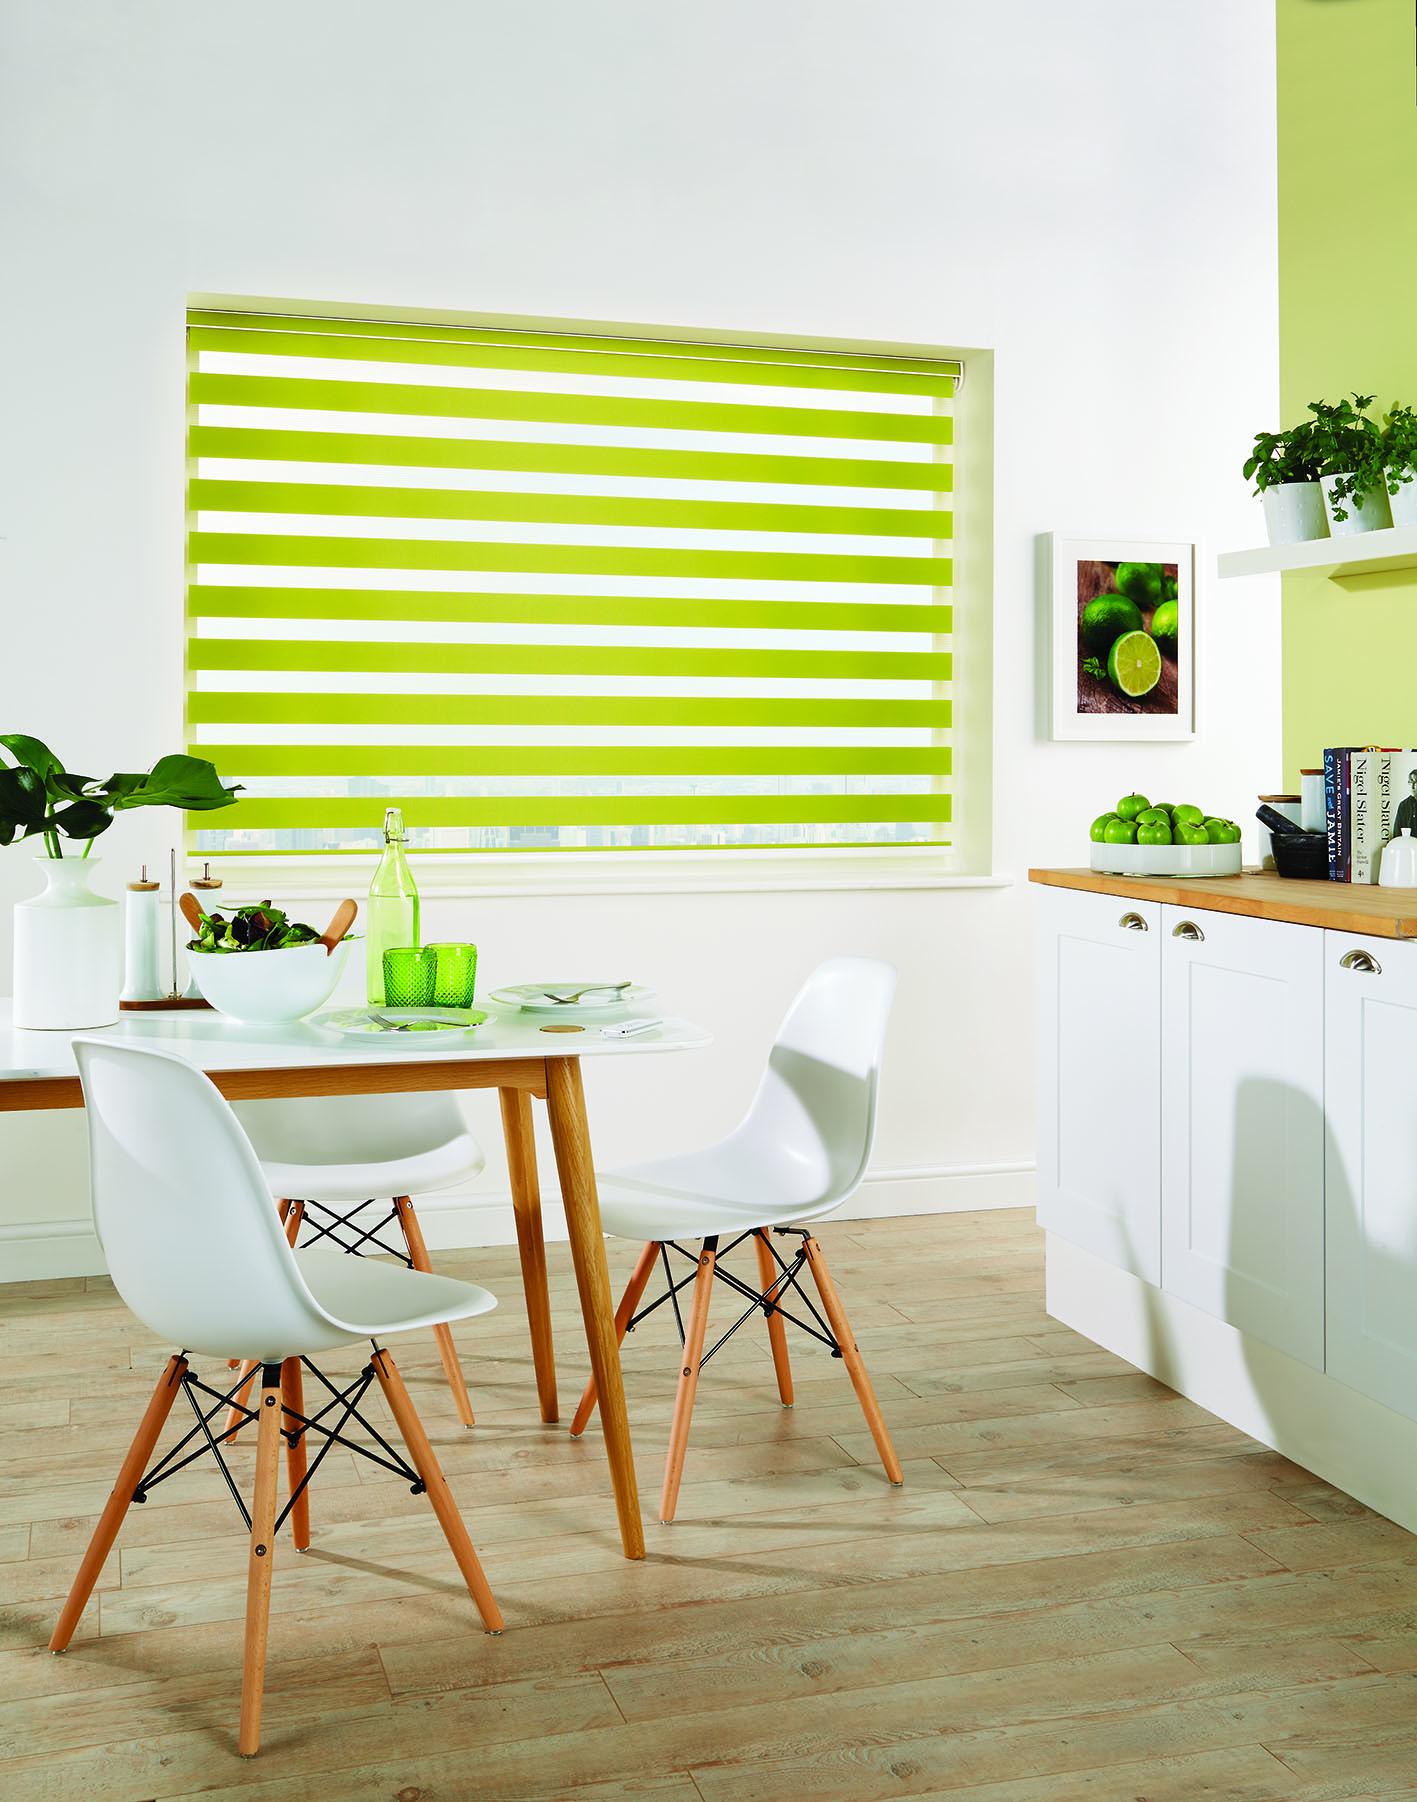 LL_Vision_Capri_Colour_Paradise_Green_closed_tanslucent_opaque_Mid1_Mail.jpg